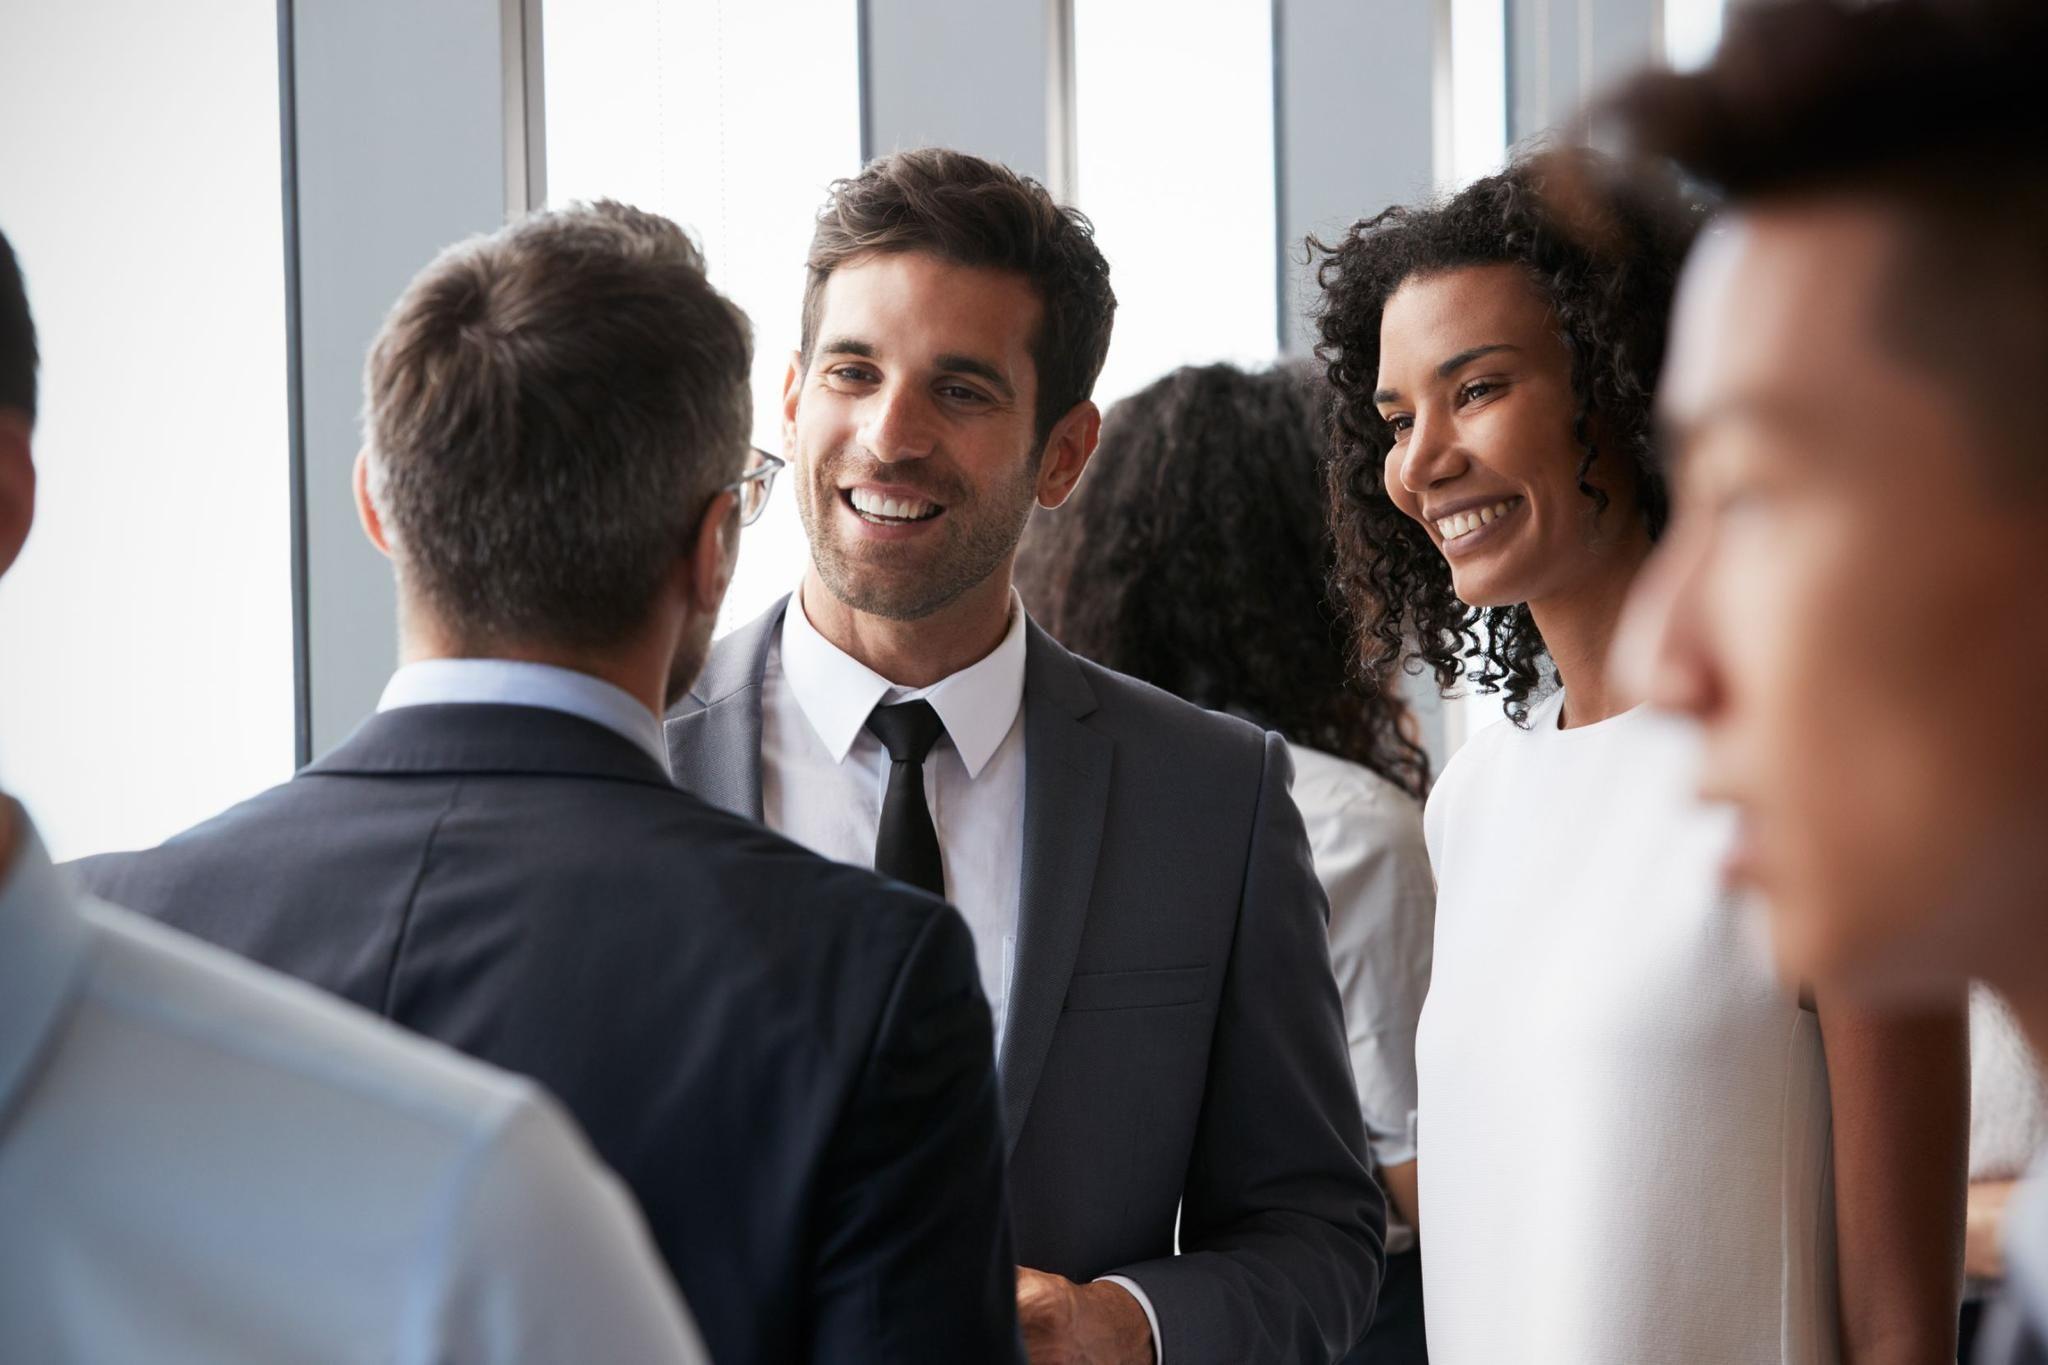 Network with industry peers